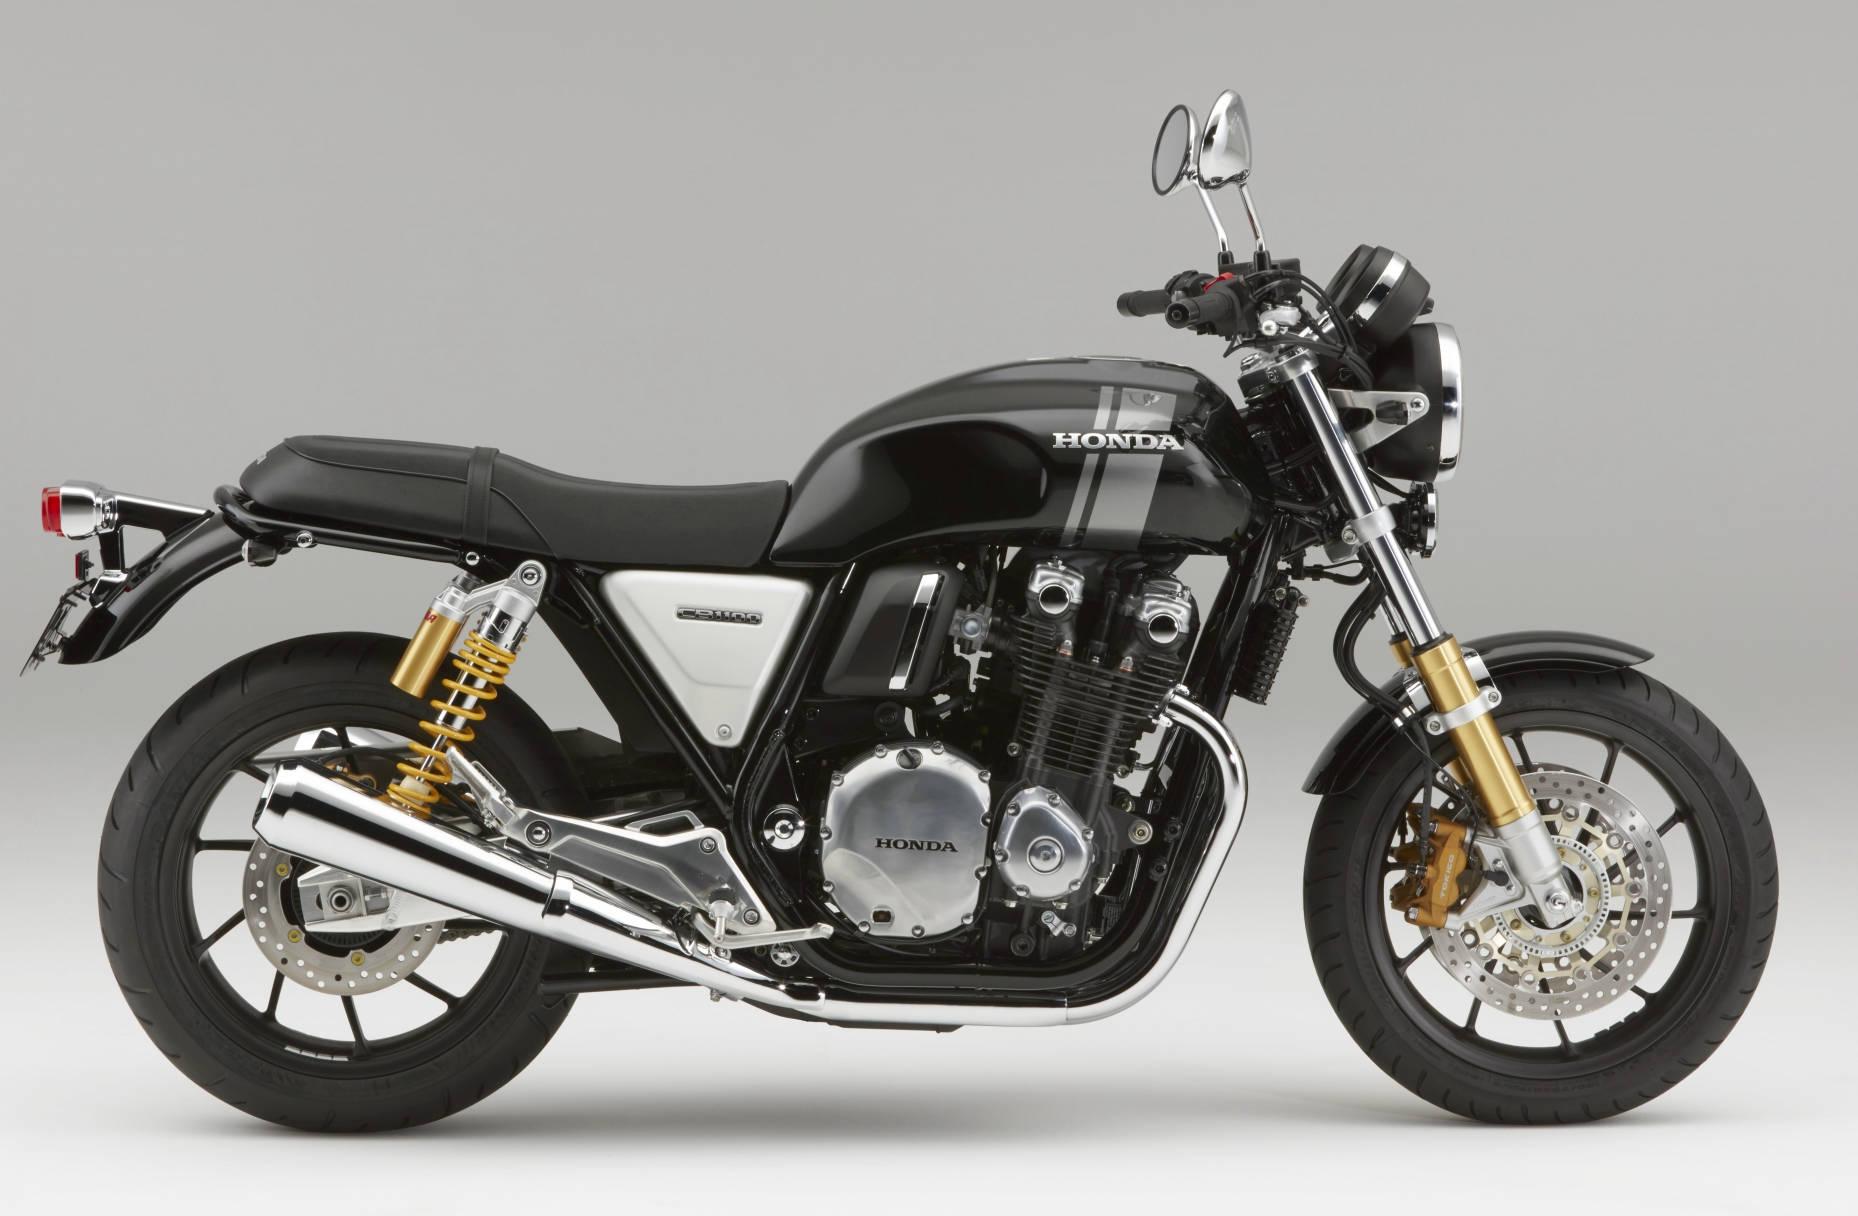 honda updates cb1100 range; includes sportier rs model